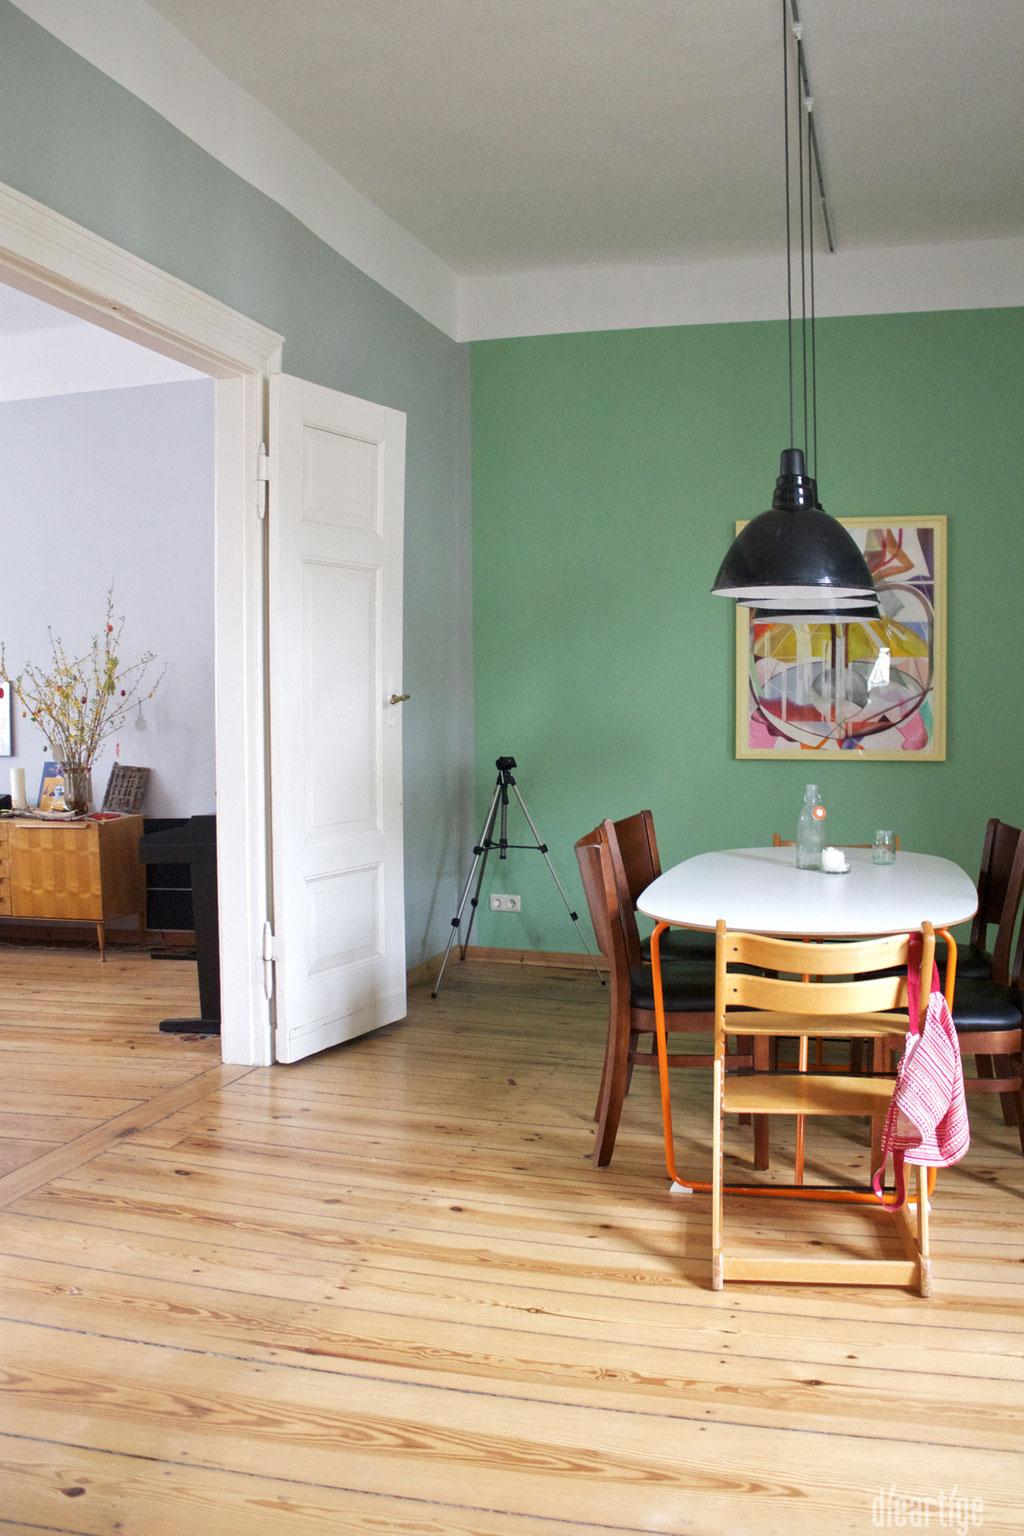 dieartige -Gestaltung | EssZi // Fam. F. | Wandfarbe Grün, Flügeltür